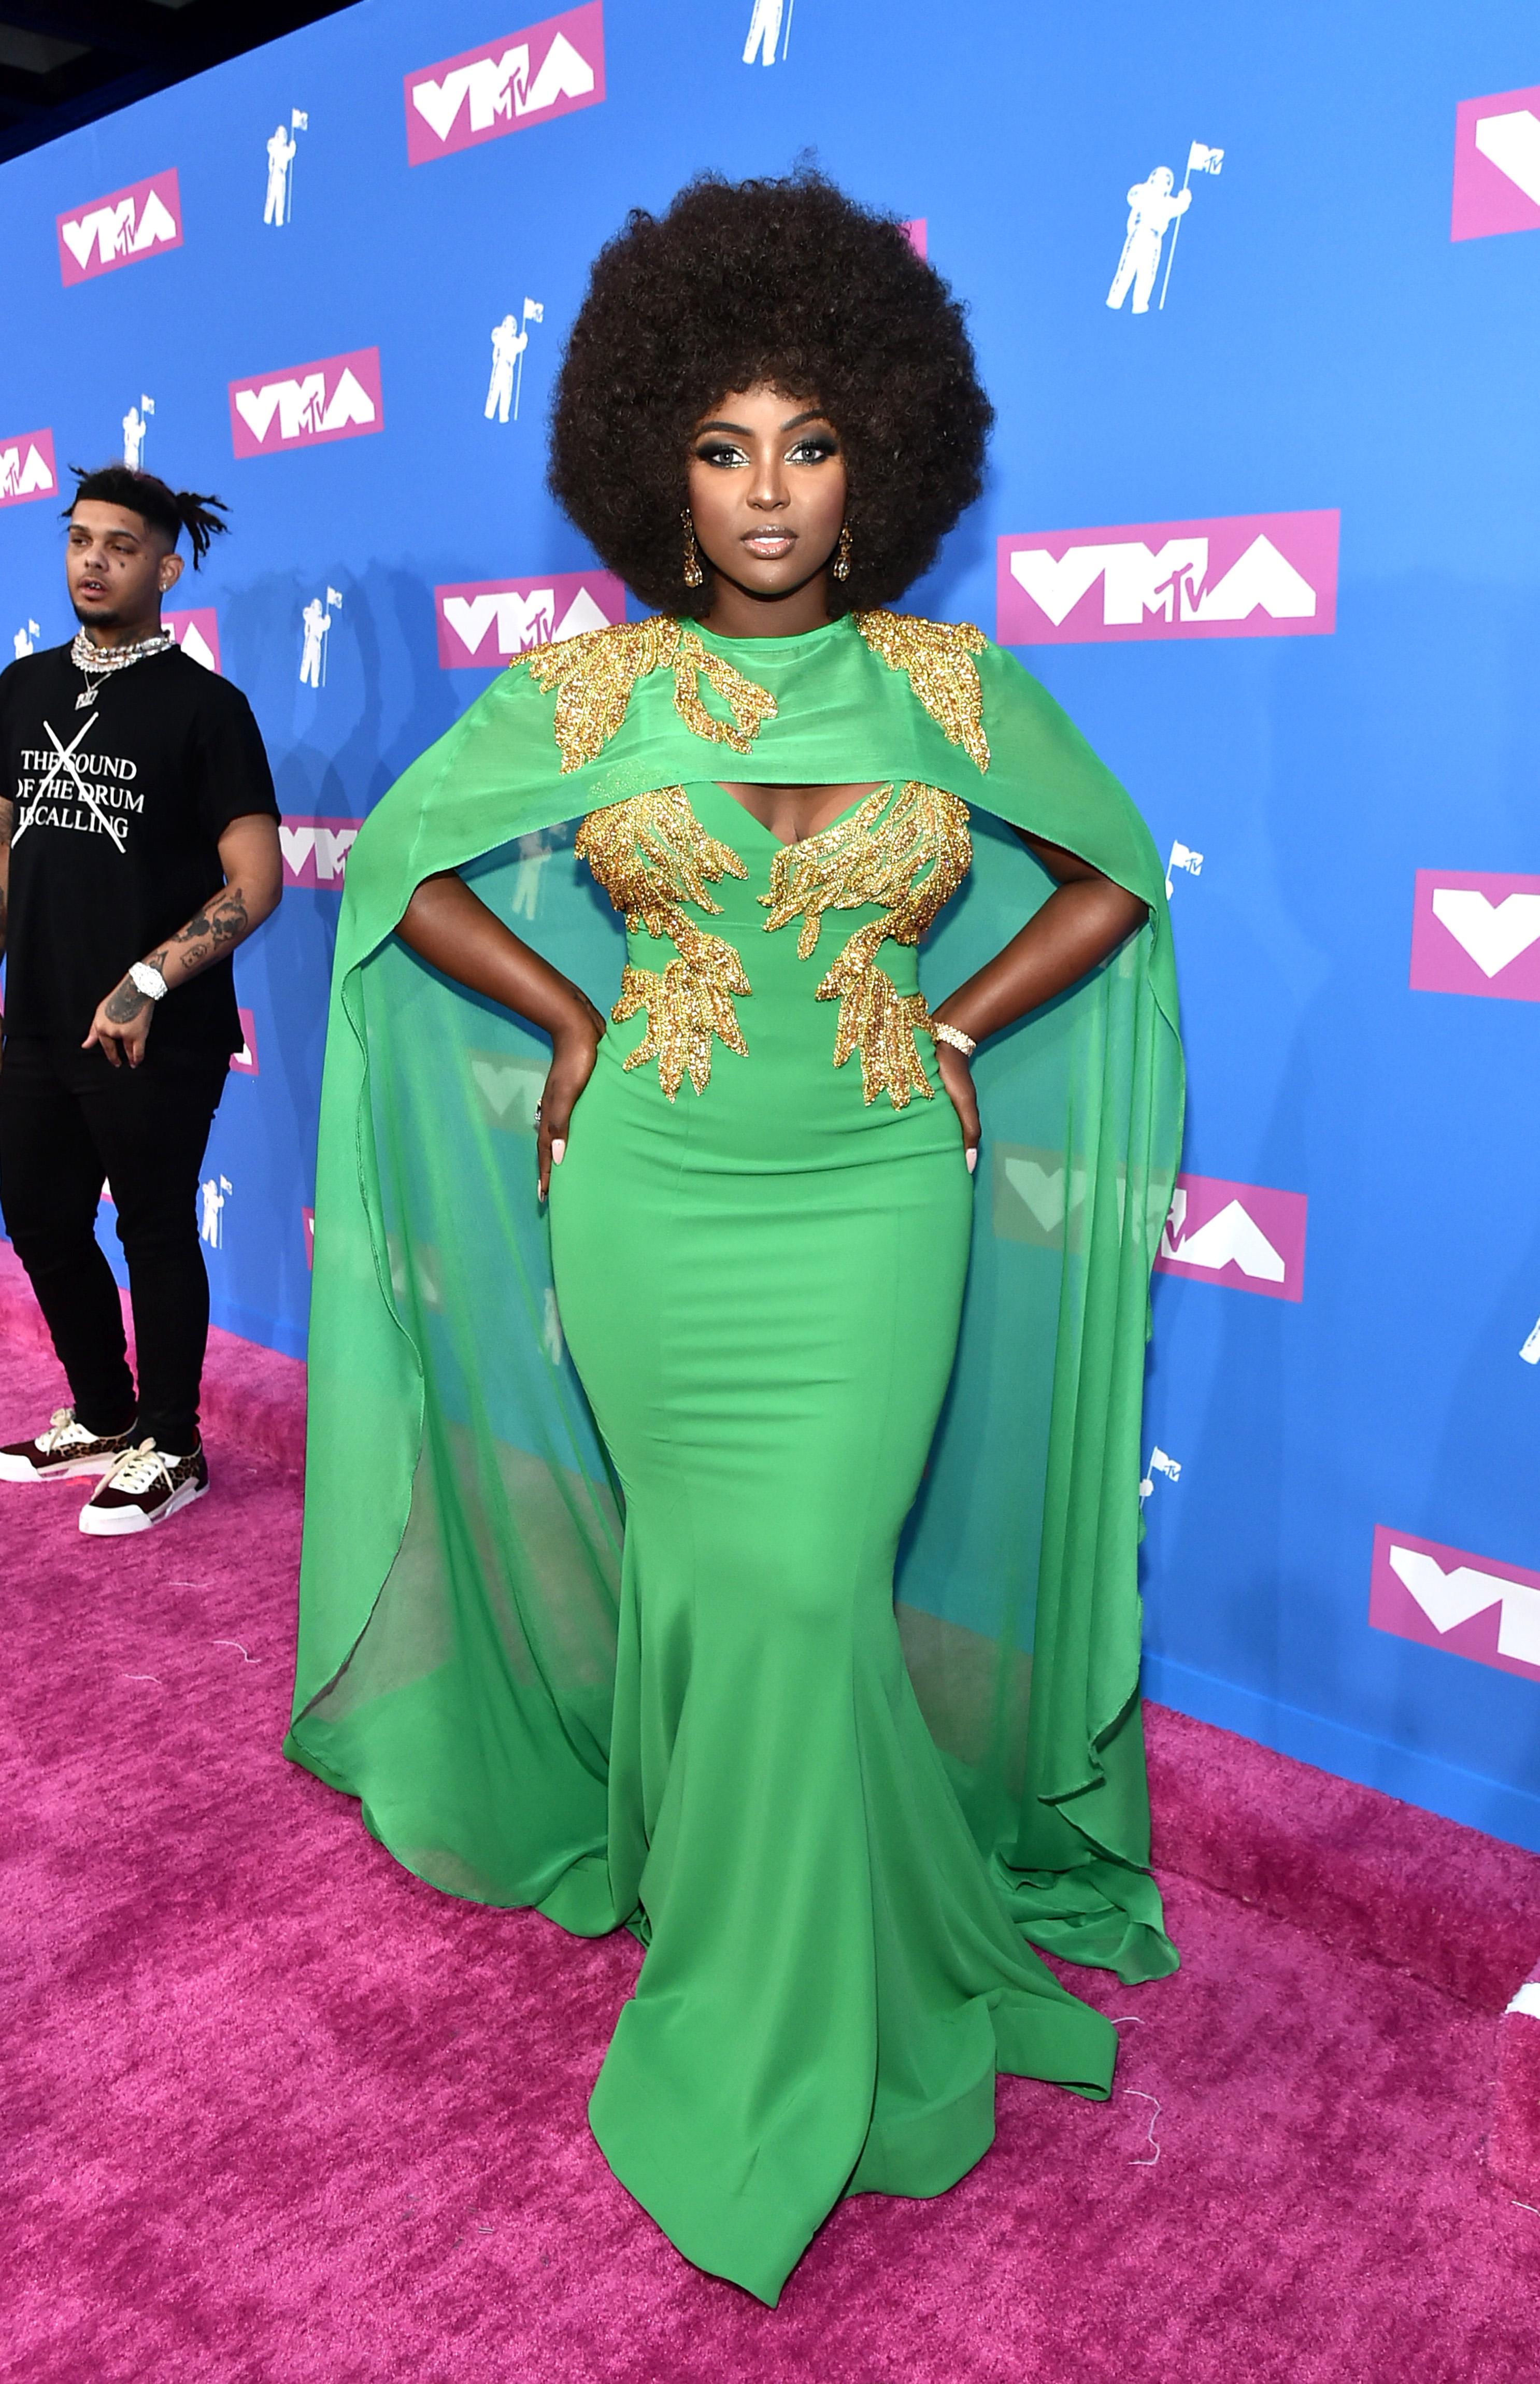 MTV Awards, famosas, estilo, alfombra roja